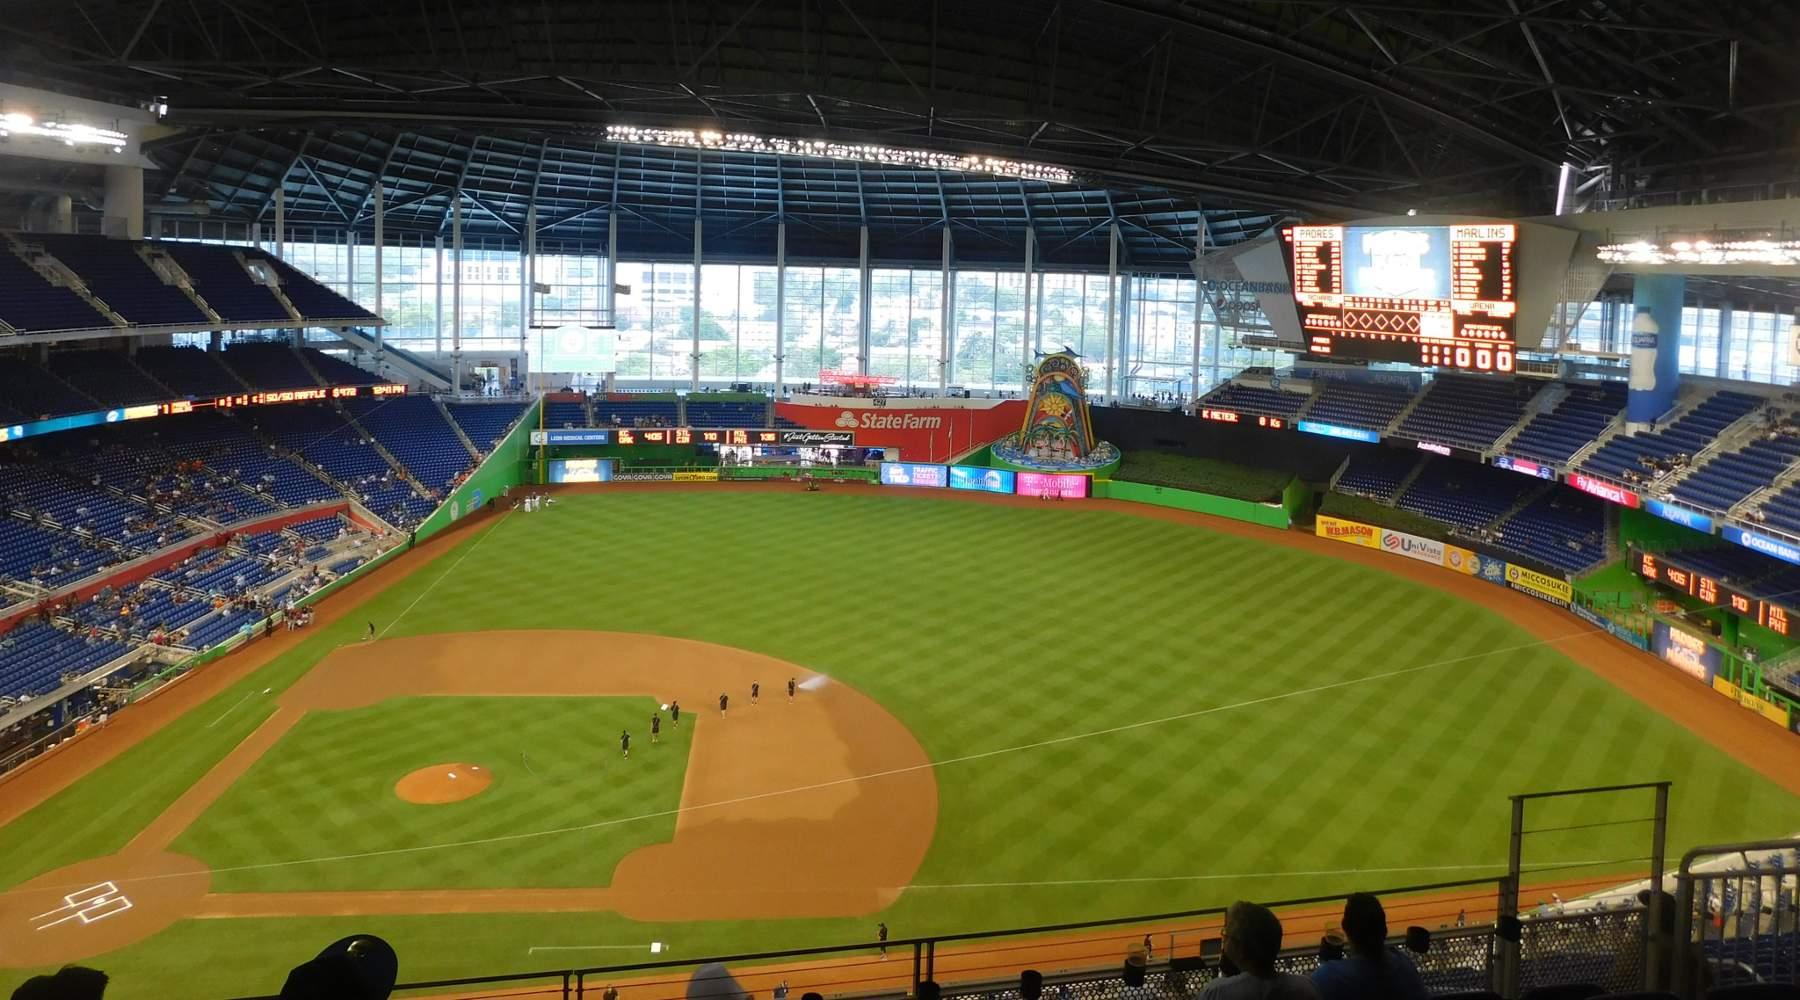 Ballpark image